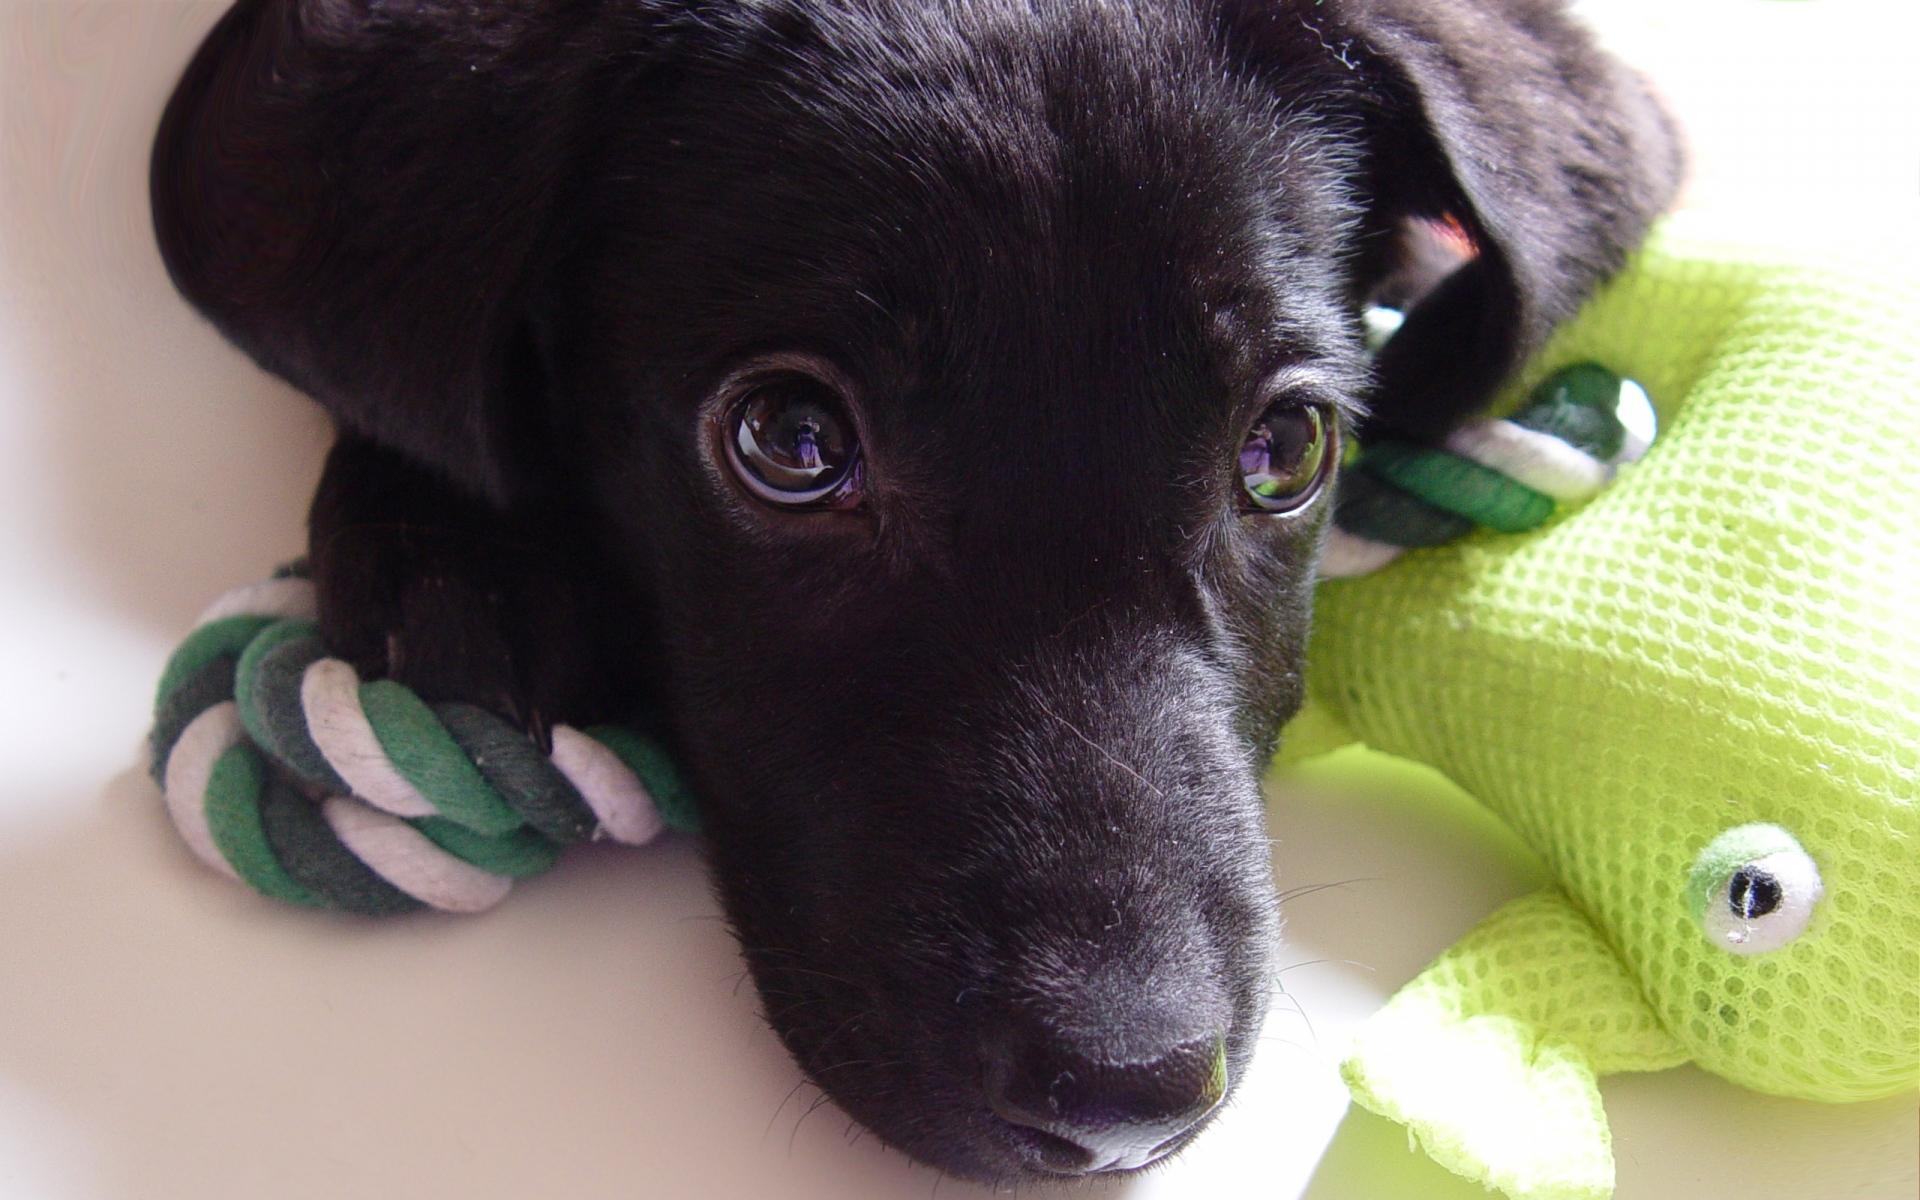 Картинки Собака, щенок, лабрадор, лицо, глаза фото и обои на рабочий стол